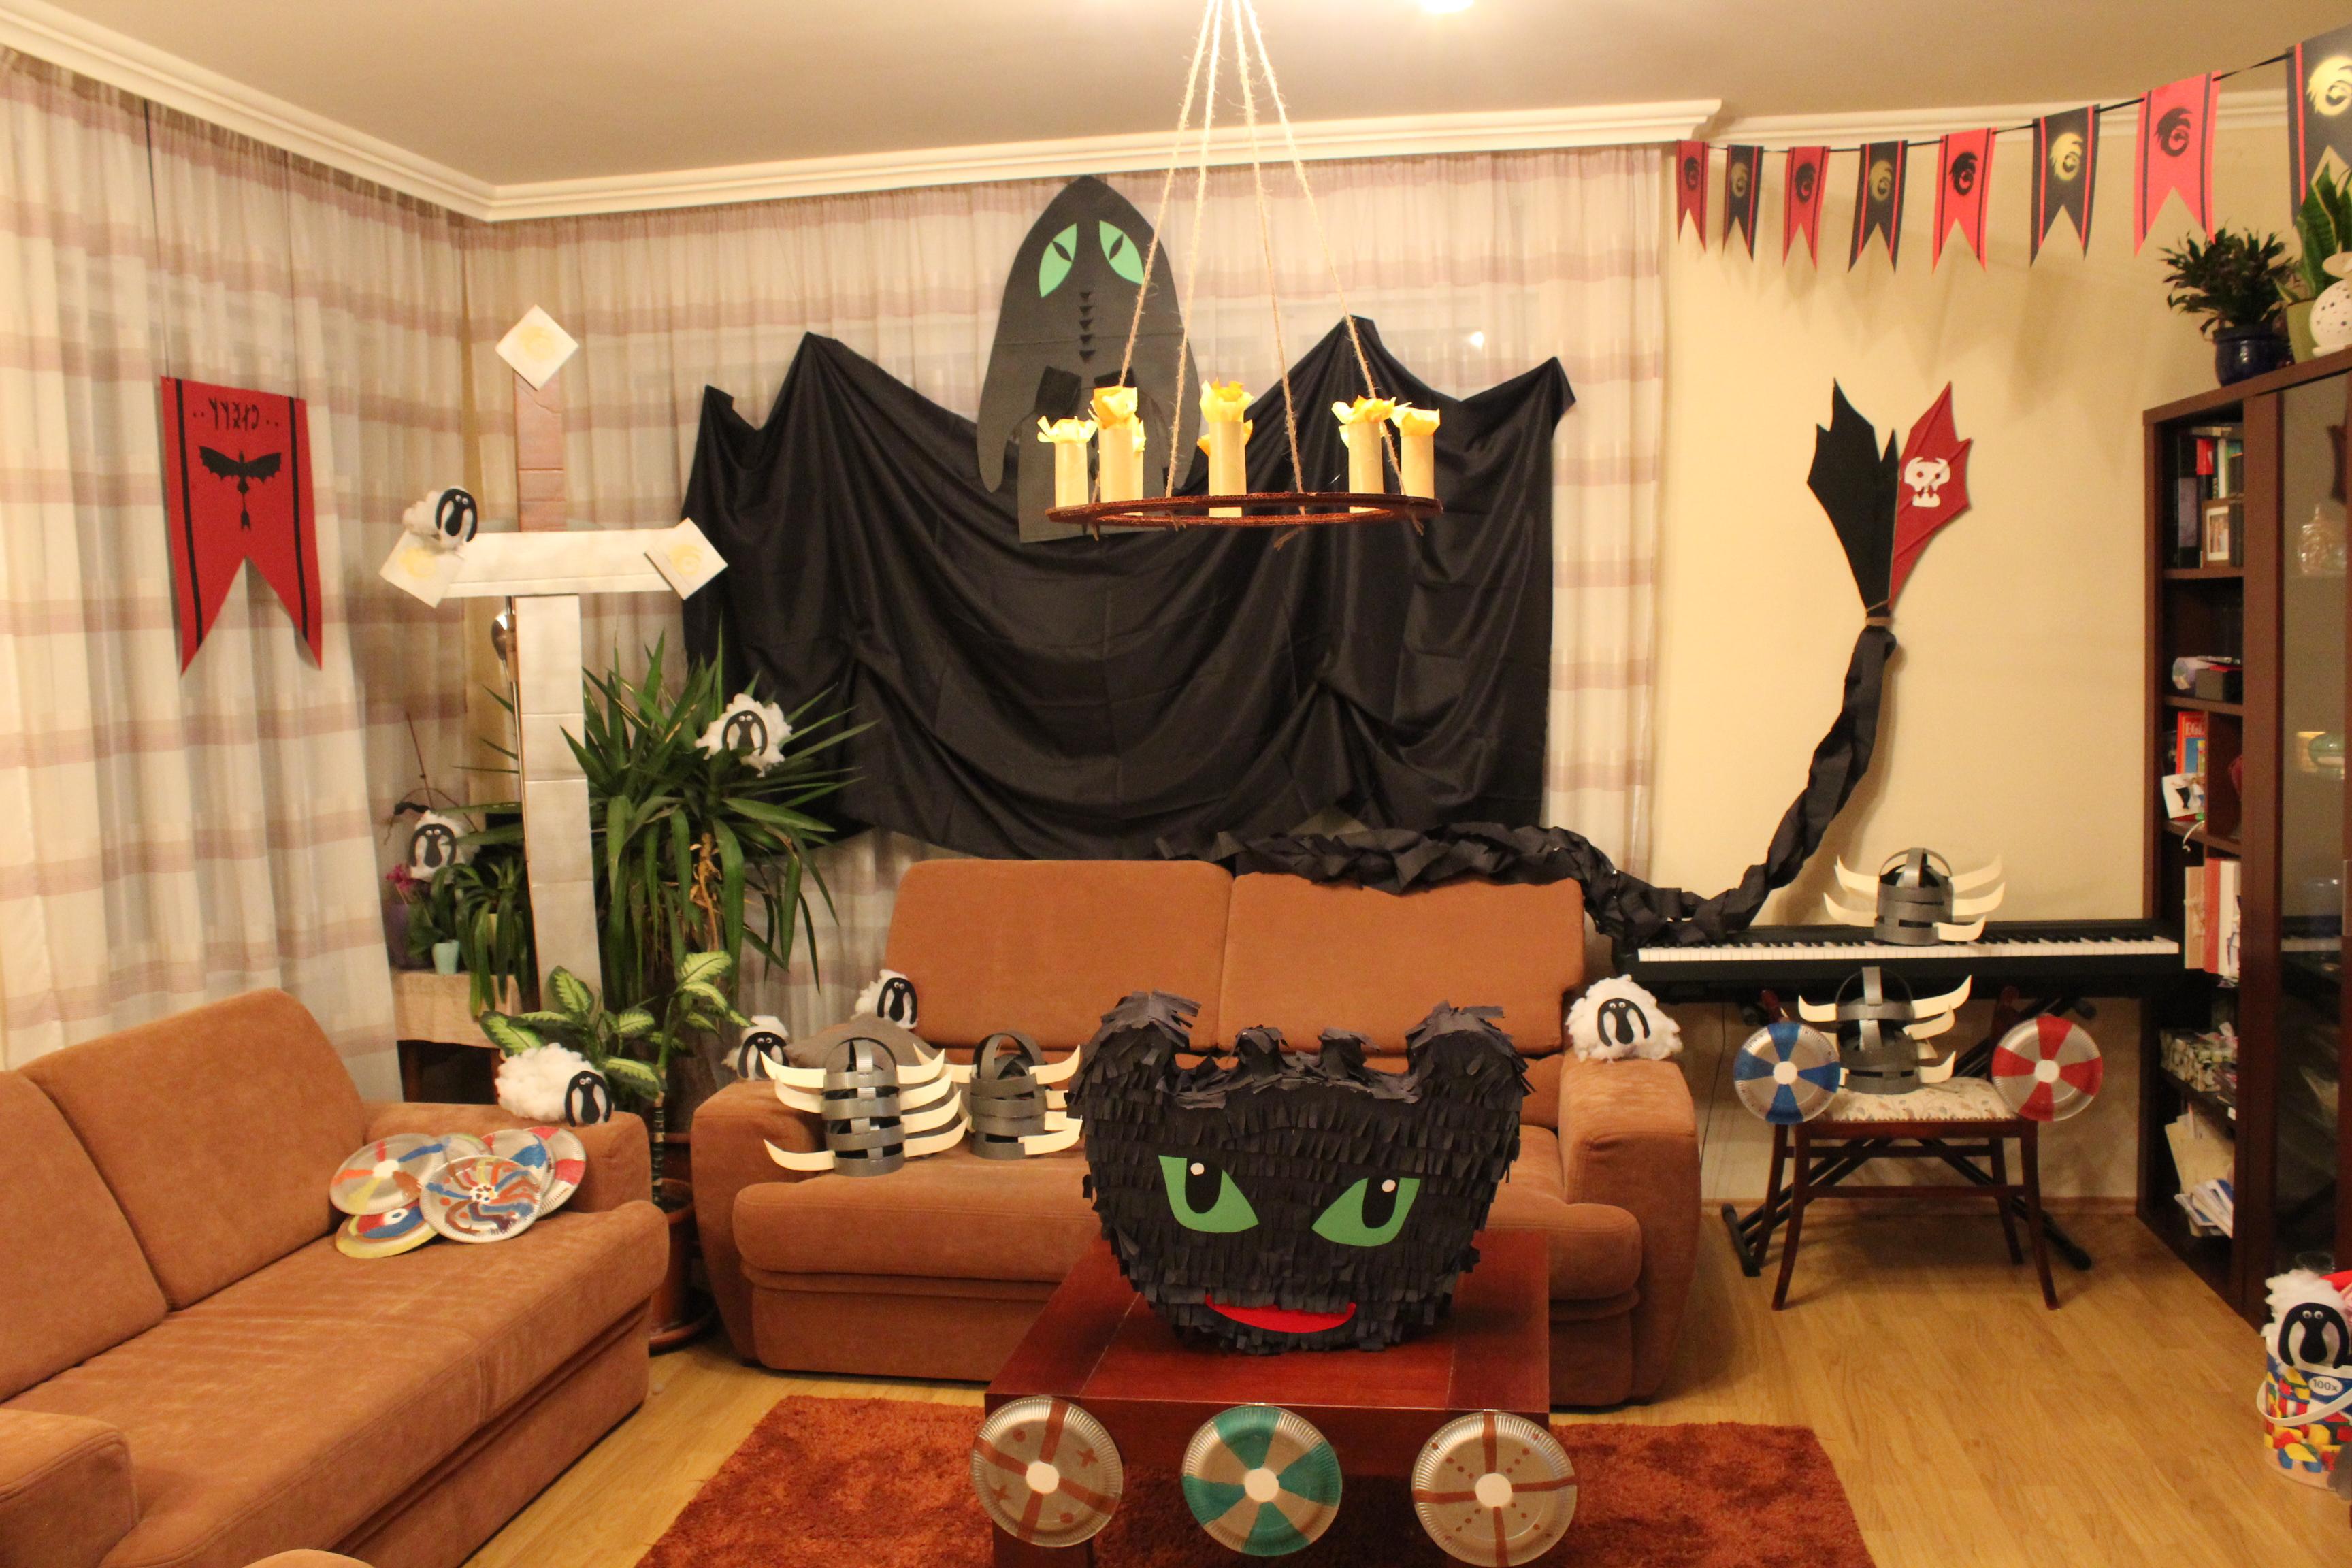 szmk_diy_csinald_magad_do_it_yourself_dekoracio_decoration_igy_neveld_how_to_train_dragon_sarkany_szuletesnapi_birthday_parti_zsur_pineta_girland_fogatlan_hablaty_totthless_buli_party_geek_mozikommuna_8_2.JPG